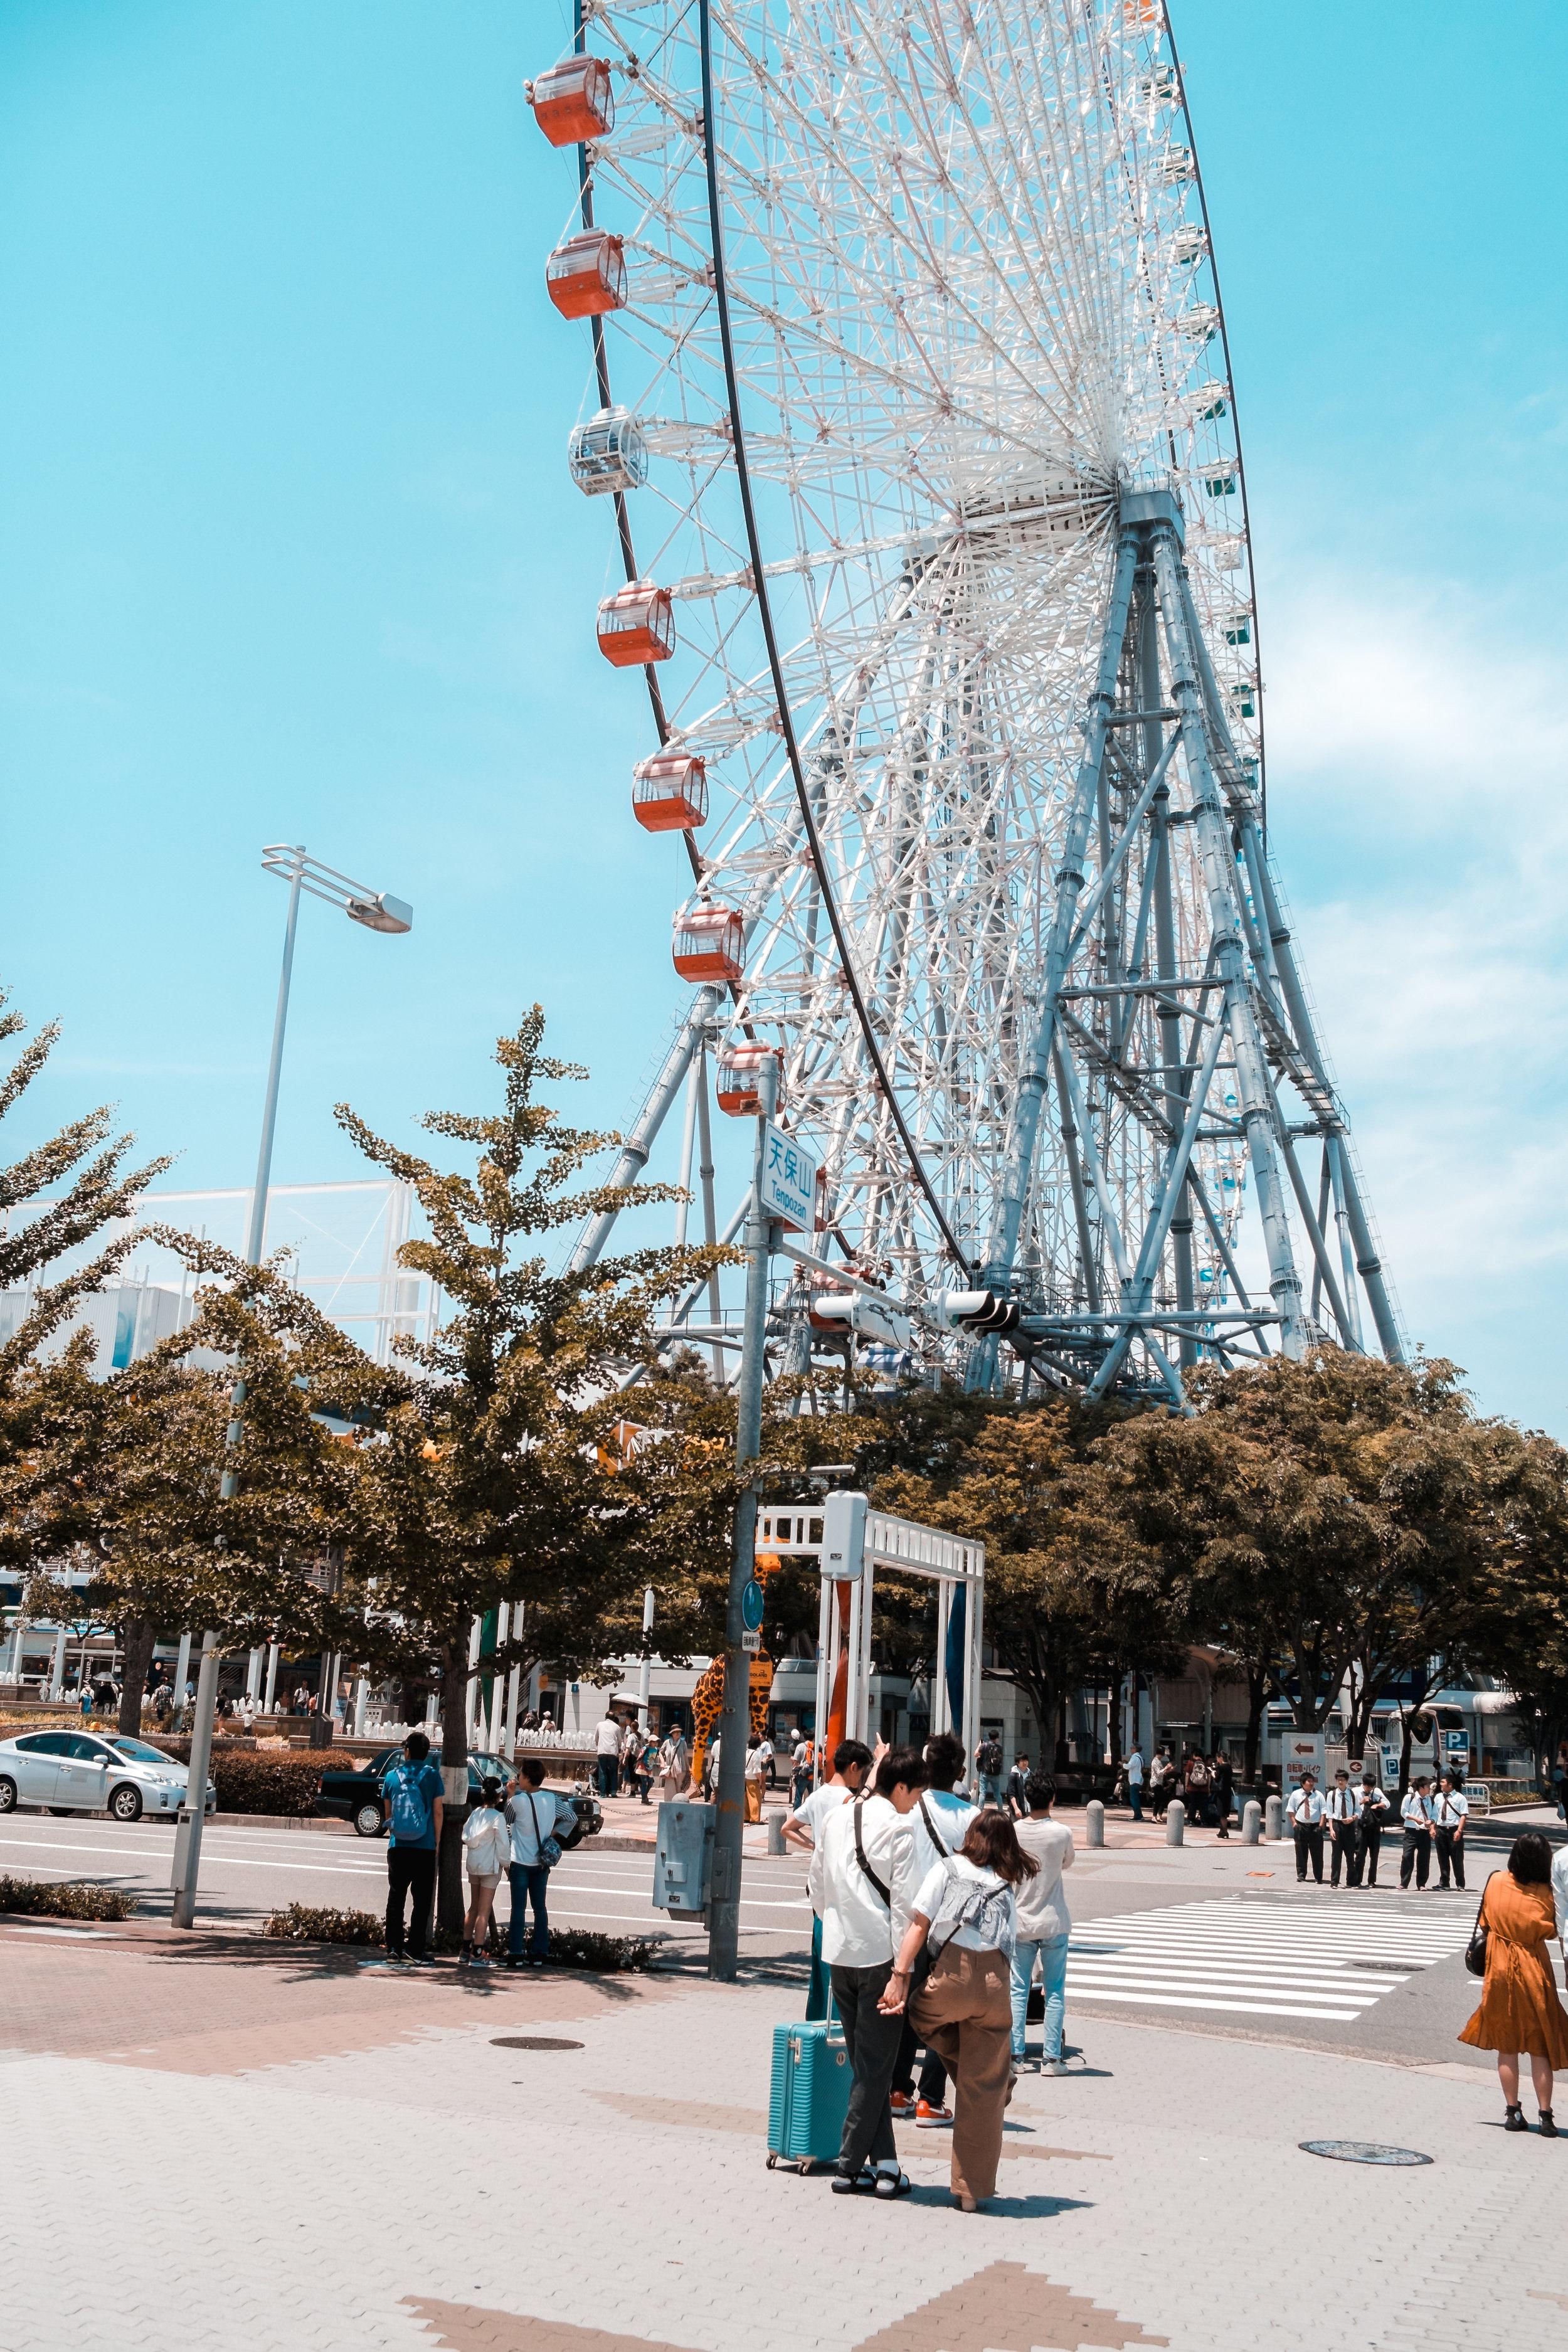 KyotoJapan_2018_AdamDillon_DSCF9904.jpg